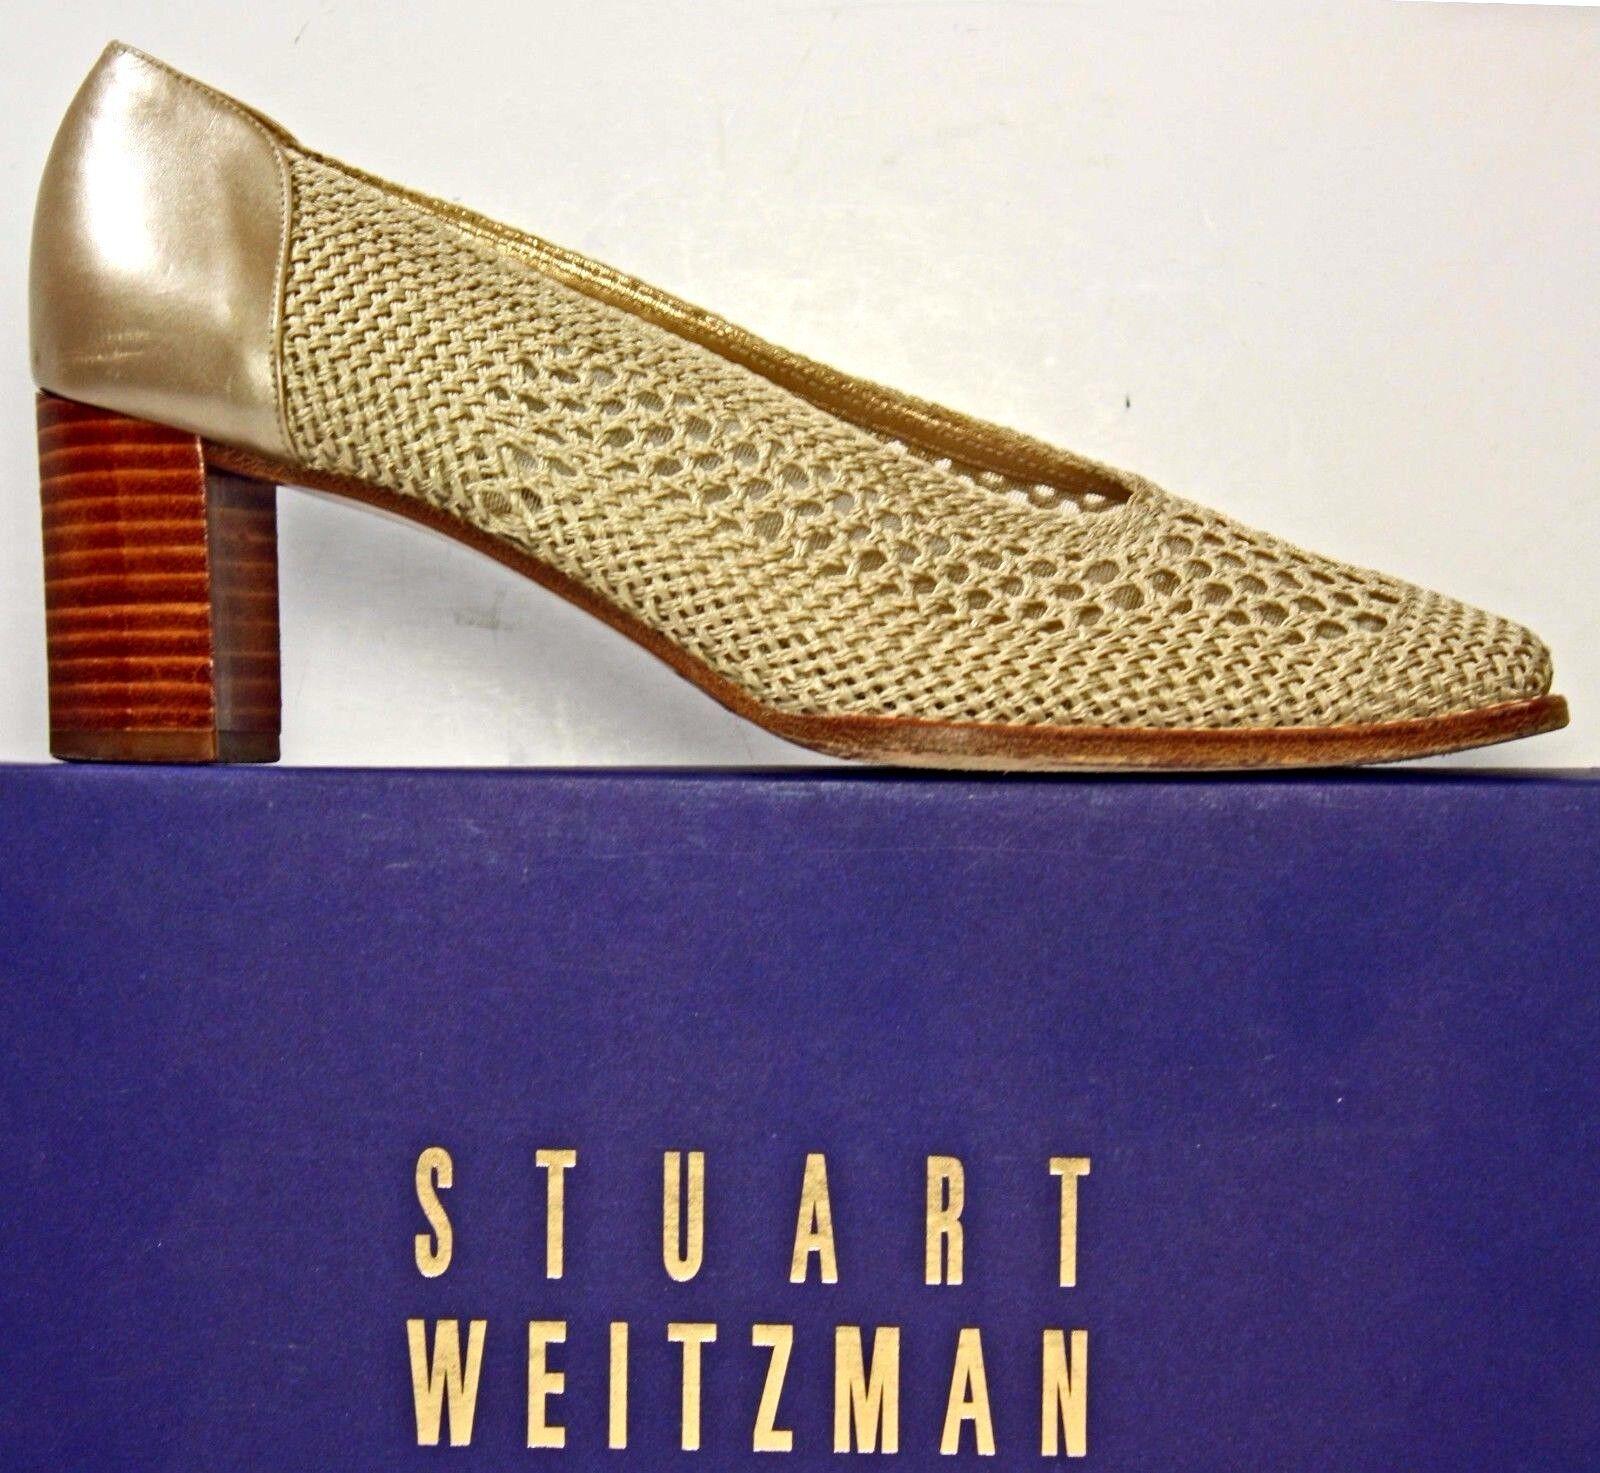 Stuart Weitzman Pumps sz 7 AA or Crocheted Bridal Wedding Evening chaussures